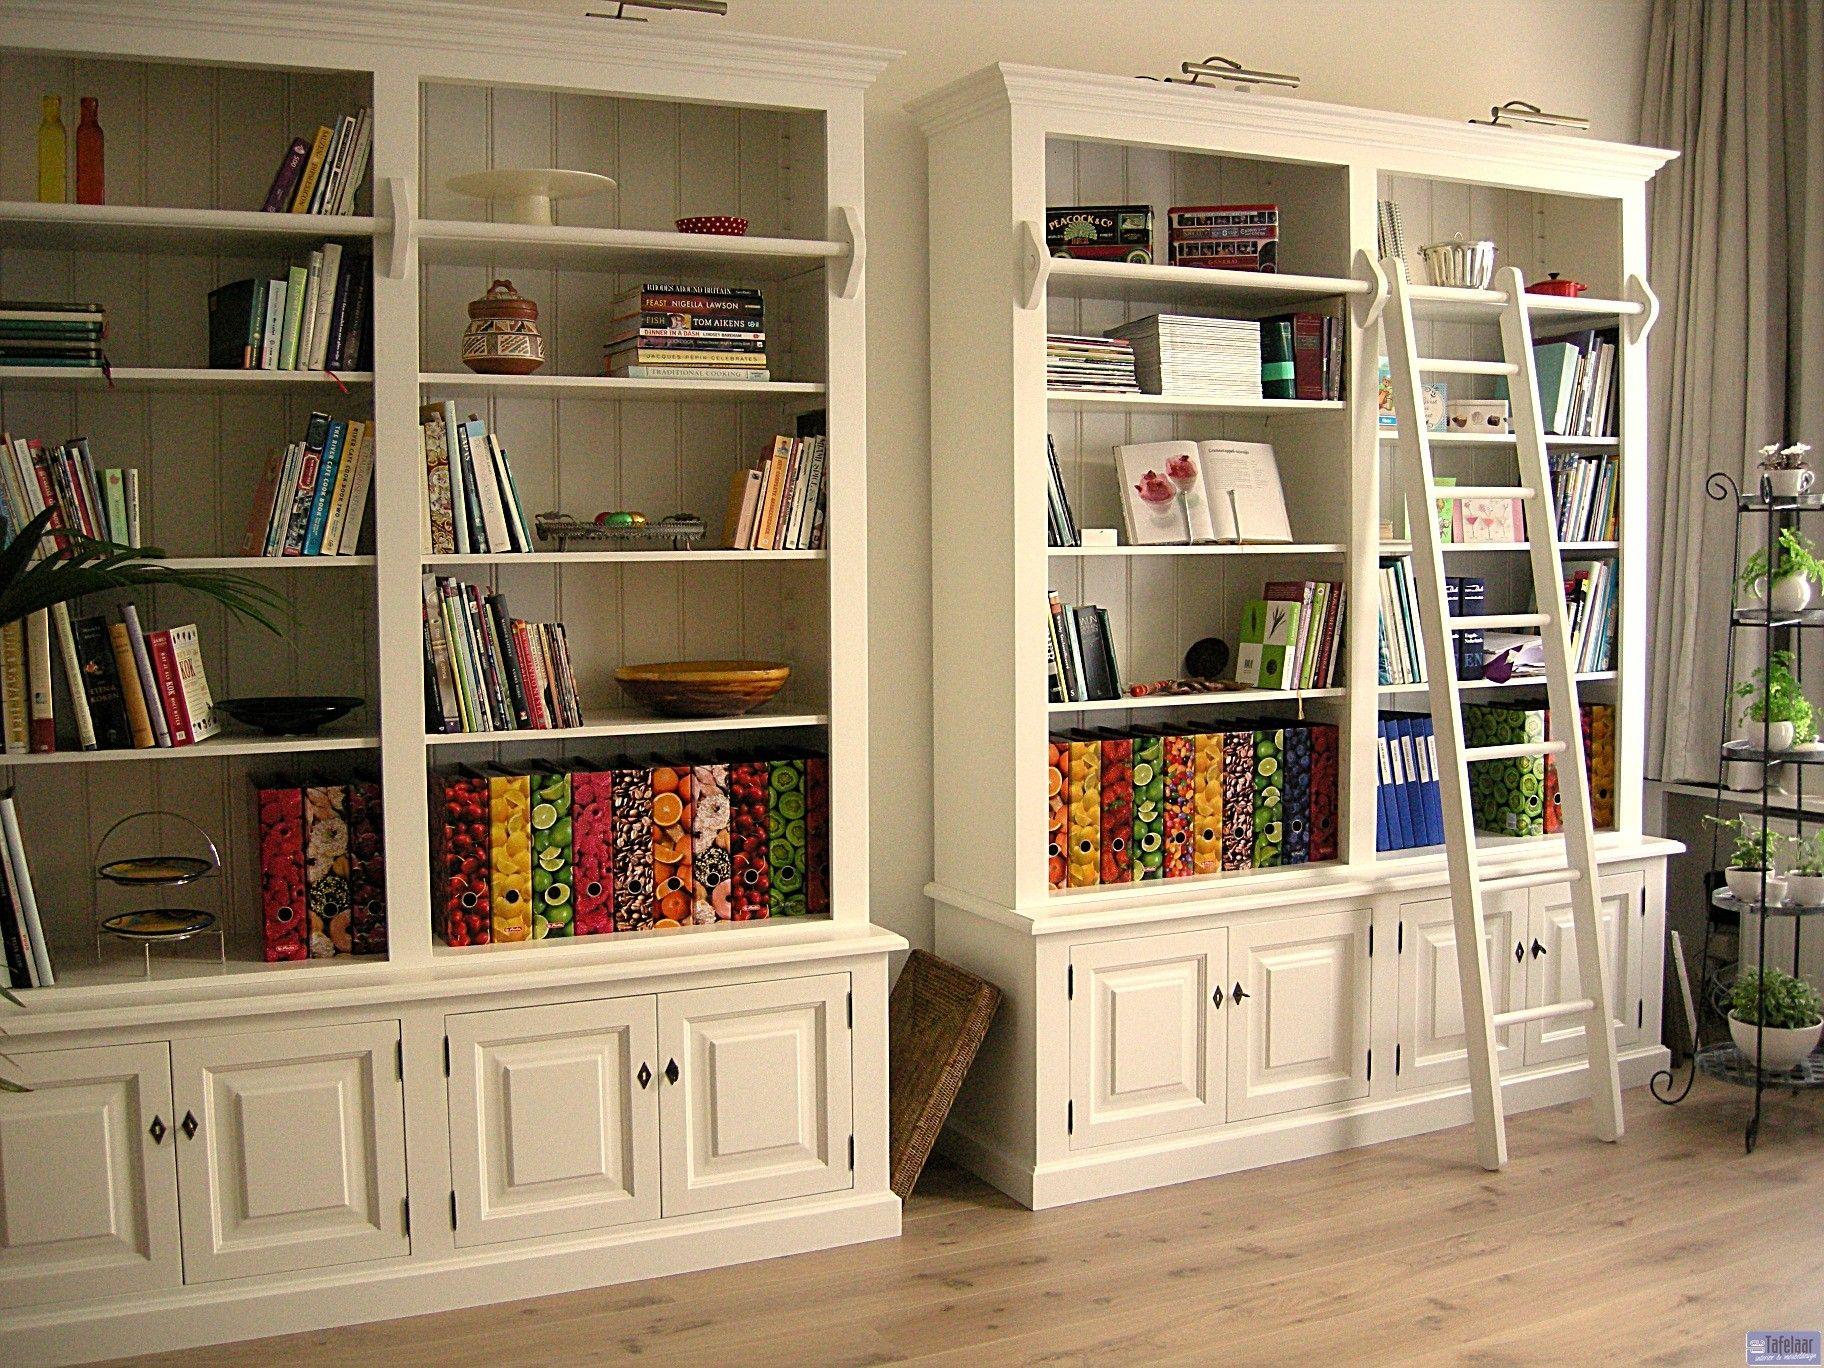 boekenkast klassiek verlichting - Google zoeken - boekenkast ...